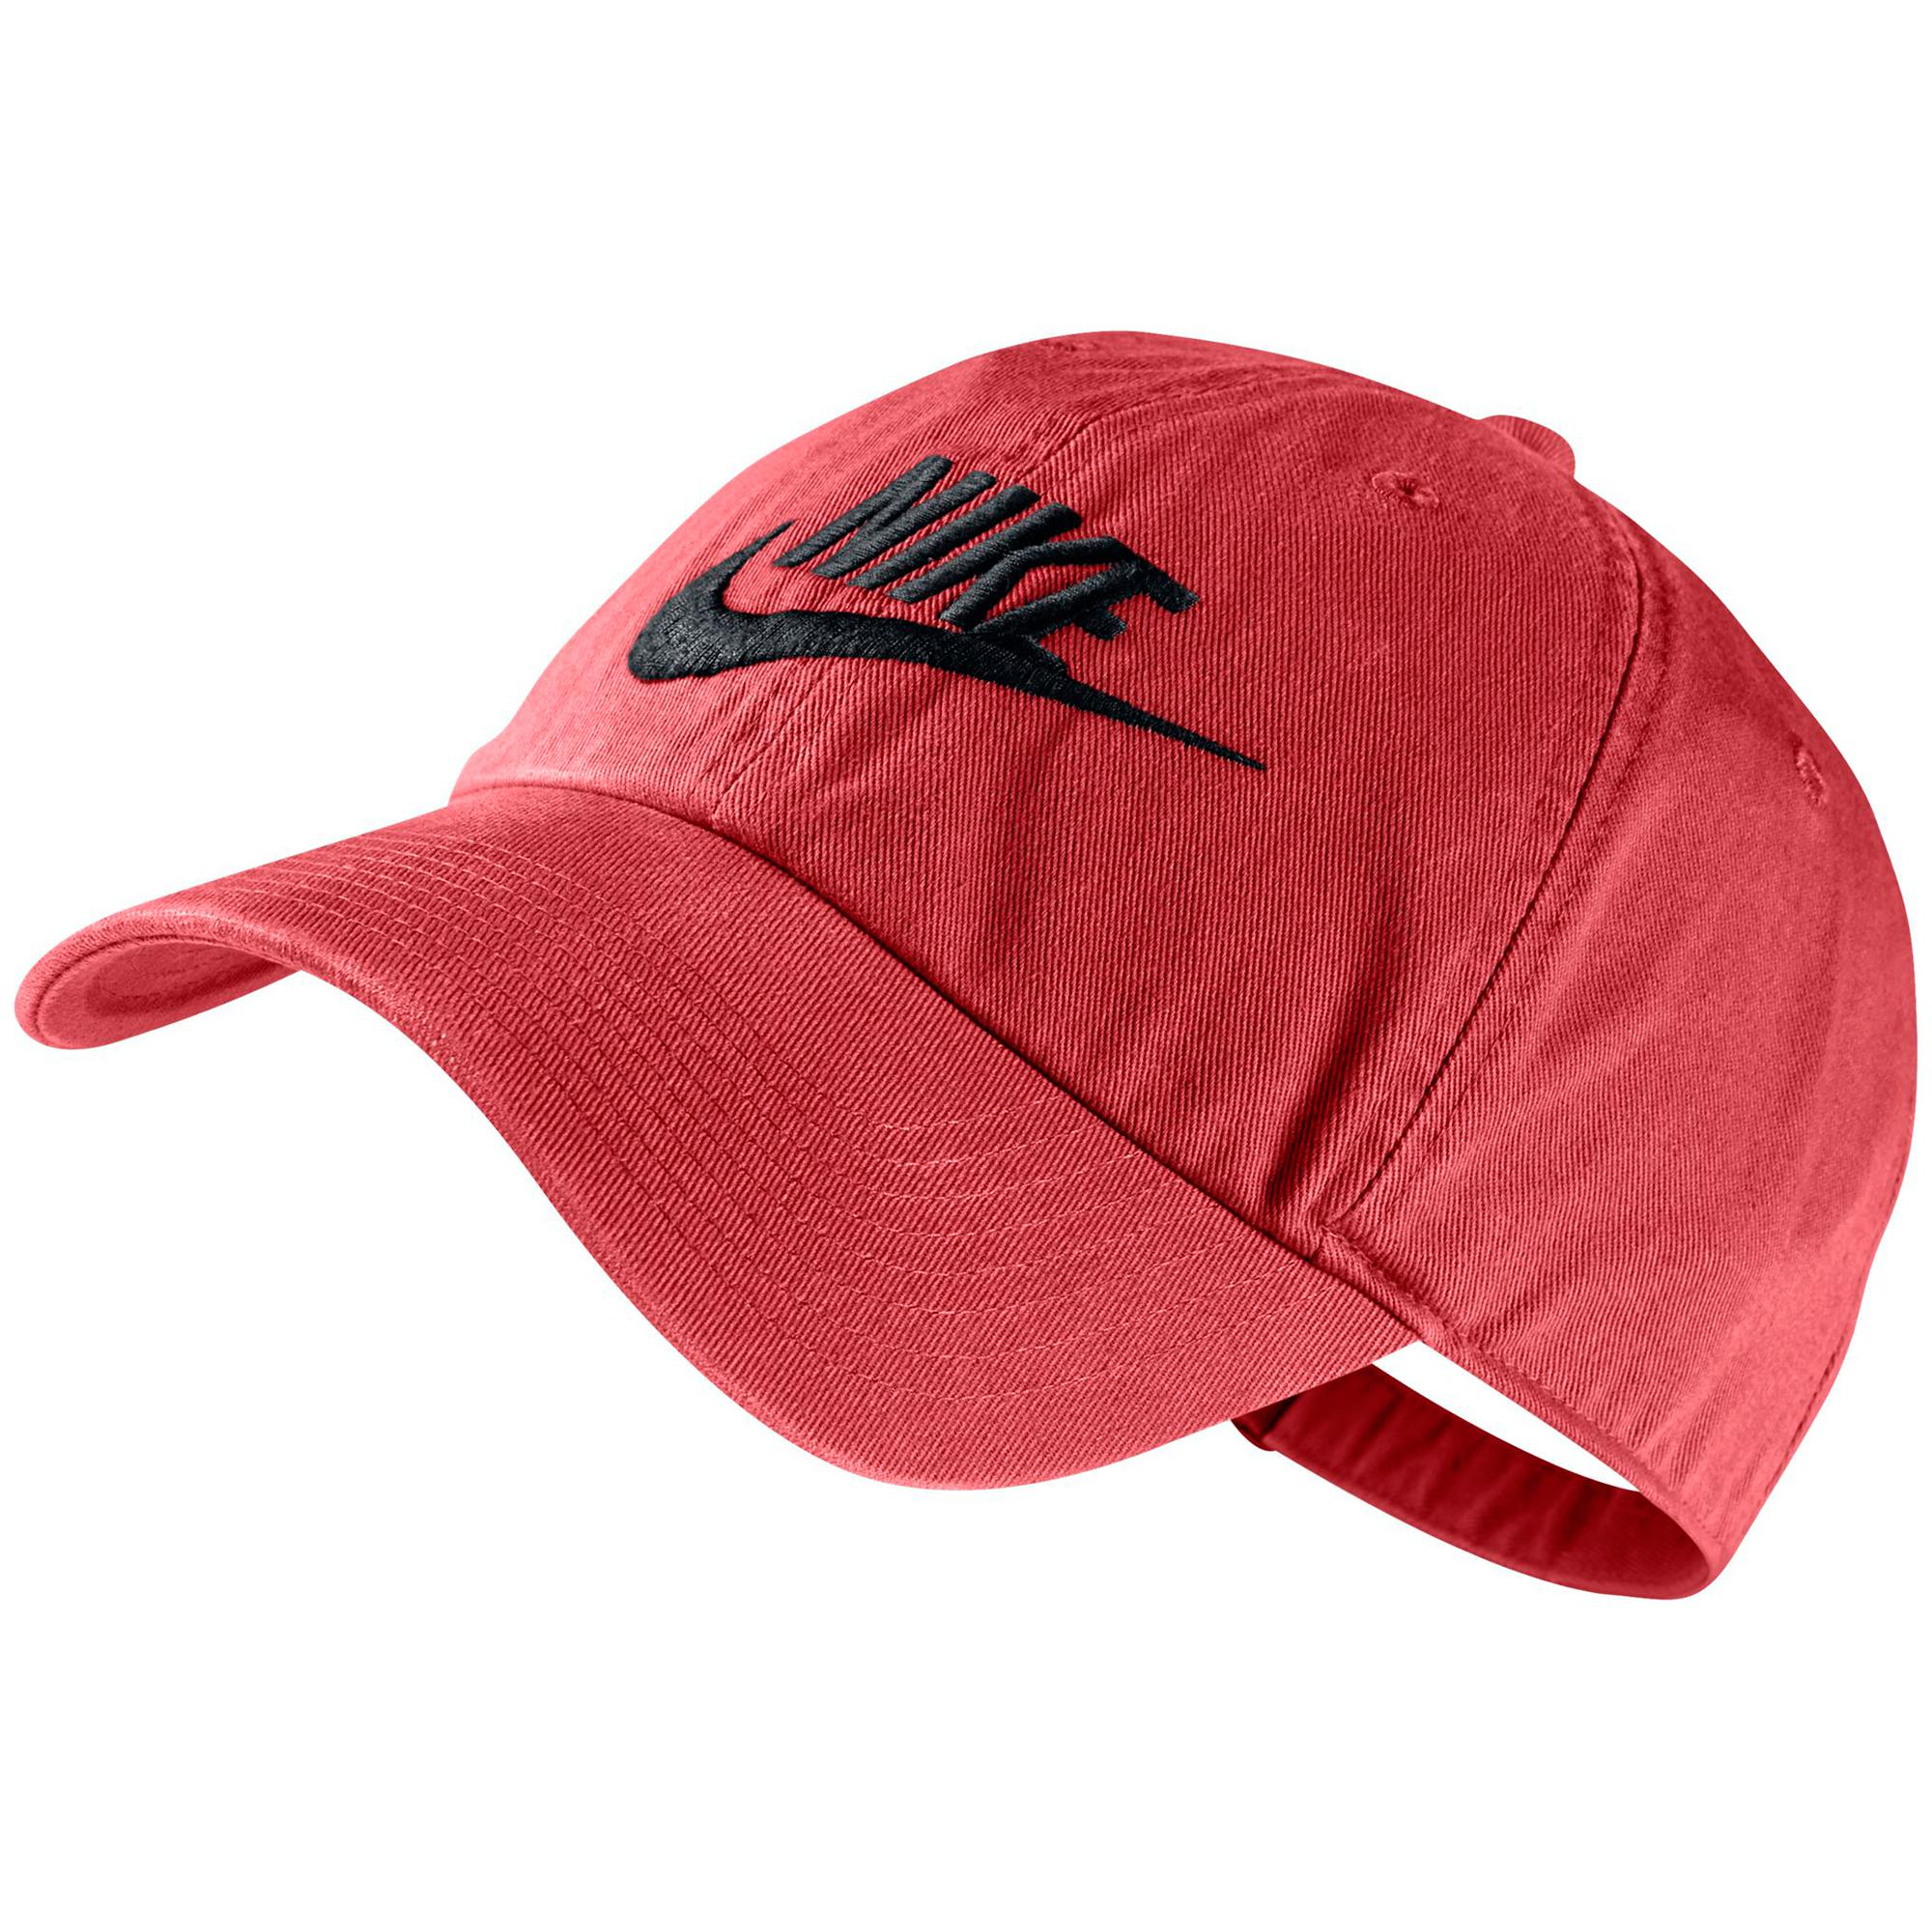 best cheap efcf1 4b3a1 Nike Futura Heritage 86 Adjustable Cap - Track Red - Tennisnuts.com